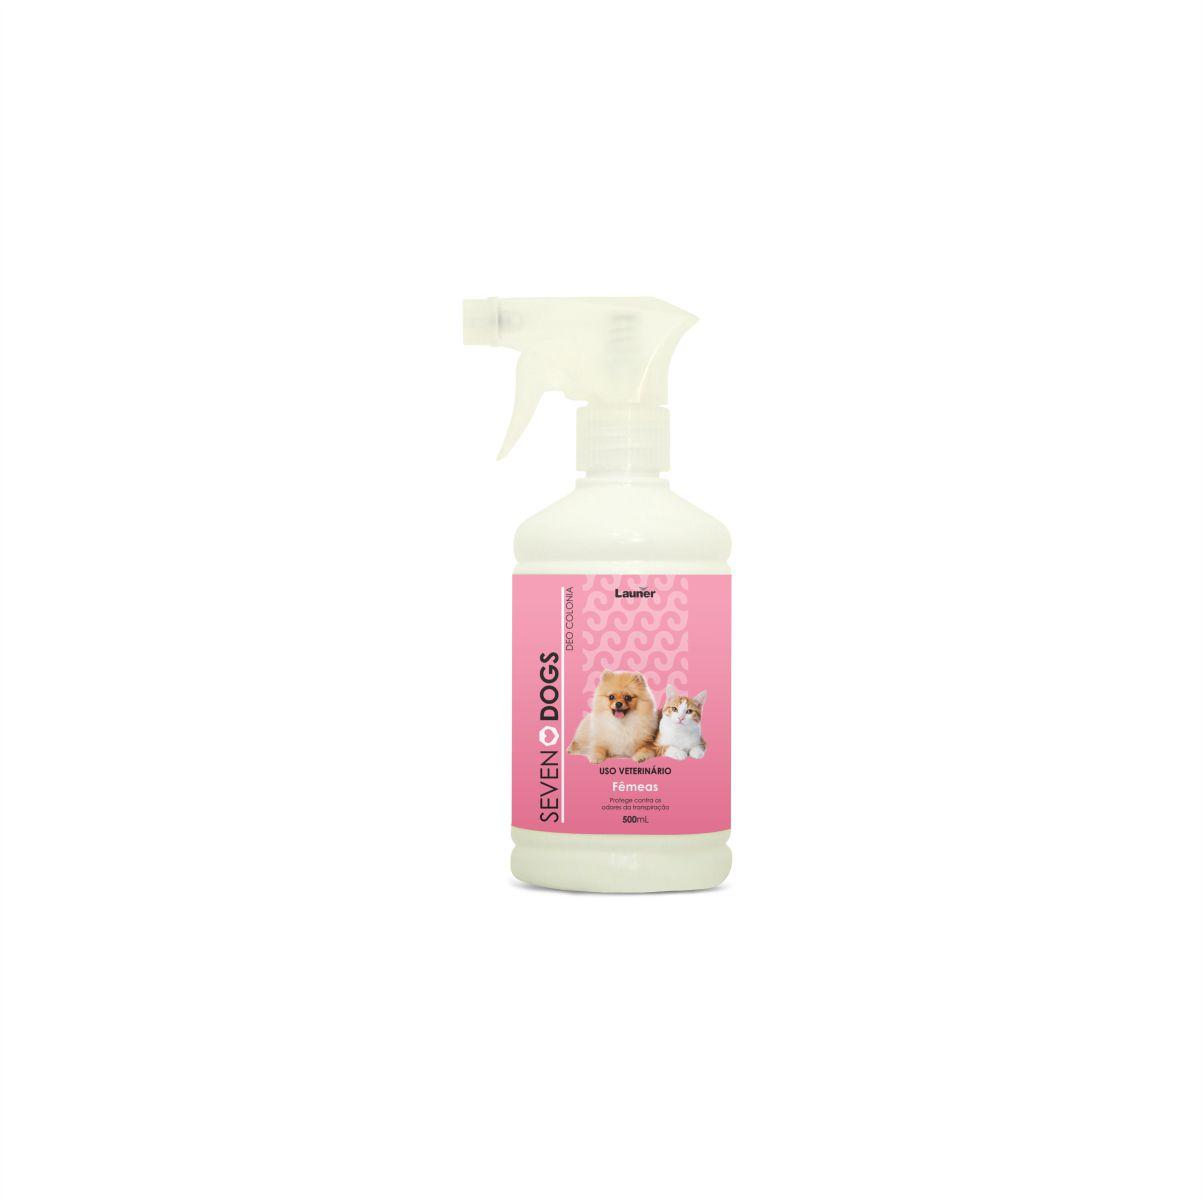 Perfume Deo Colonia para Cachorro Femeas Seven Dogs 500 ml